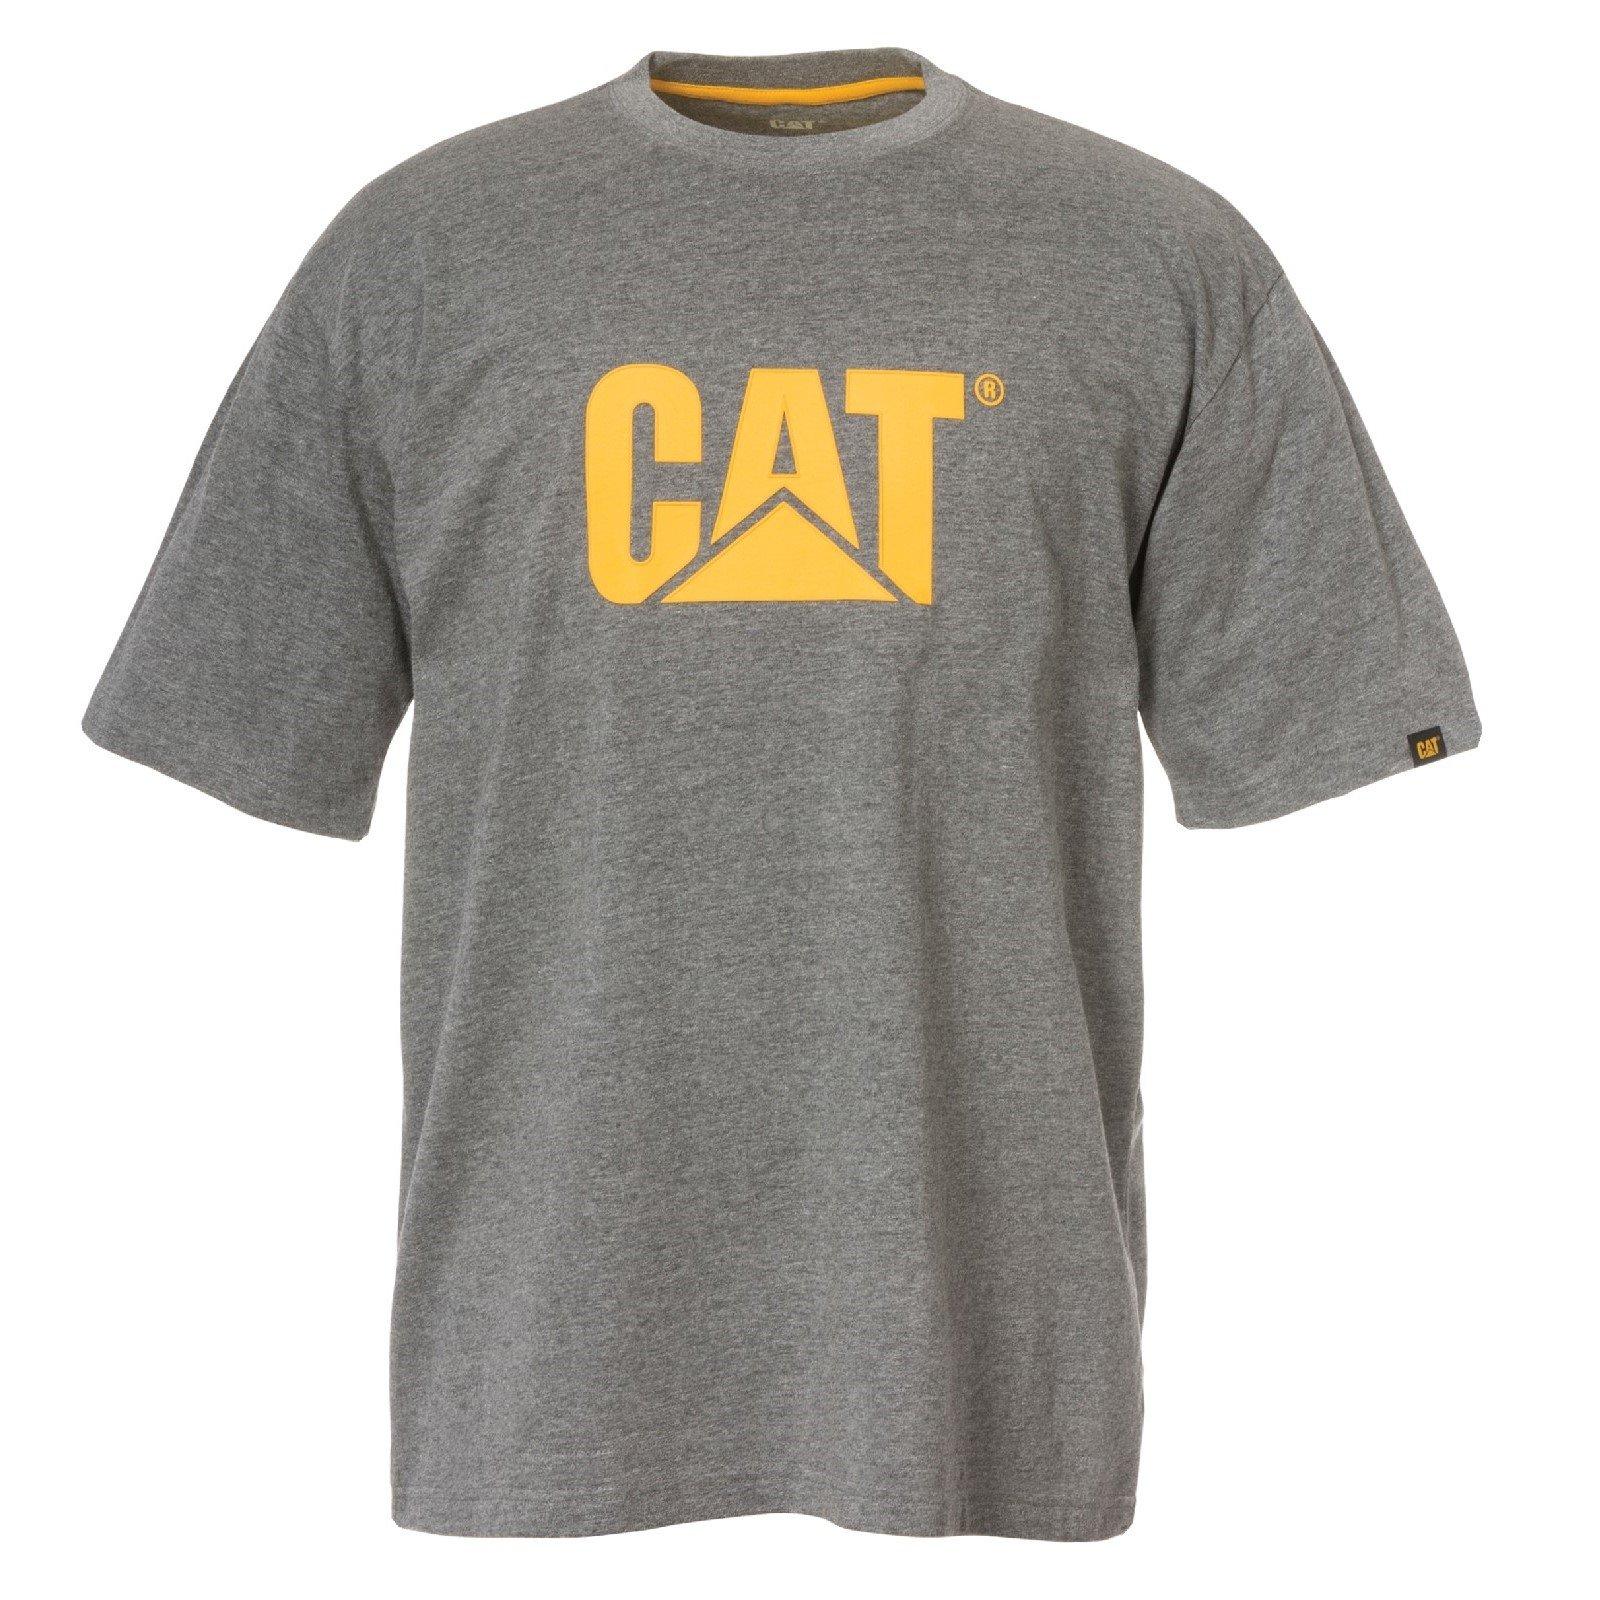 Caterpillar Men's Trademark Logo T-Shirt Various Colours 25301-42086 - Dark Heather Grey 4X